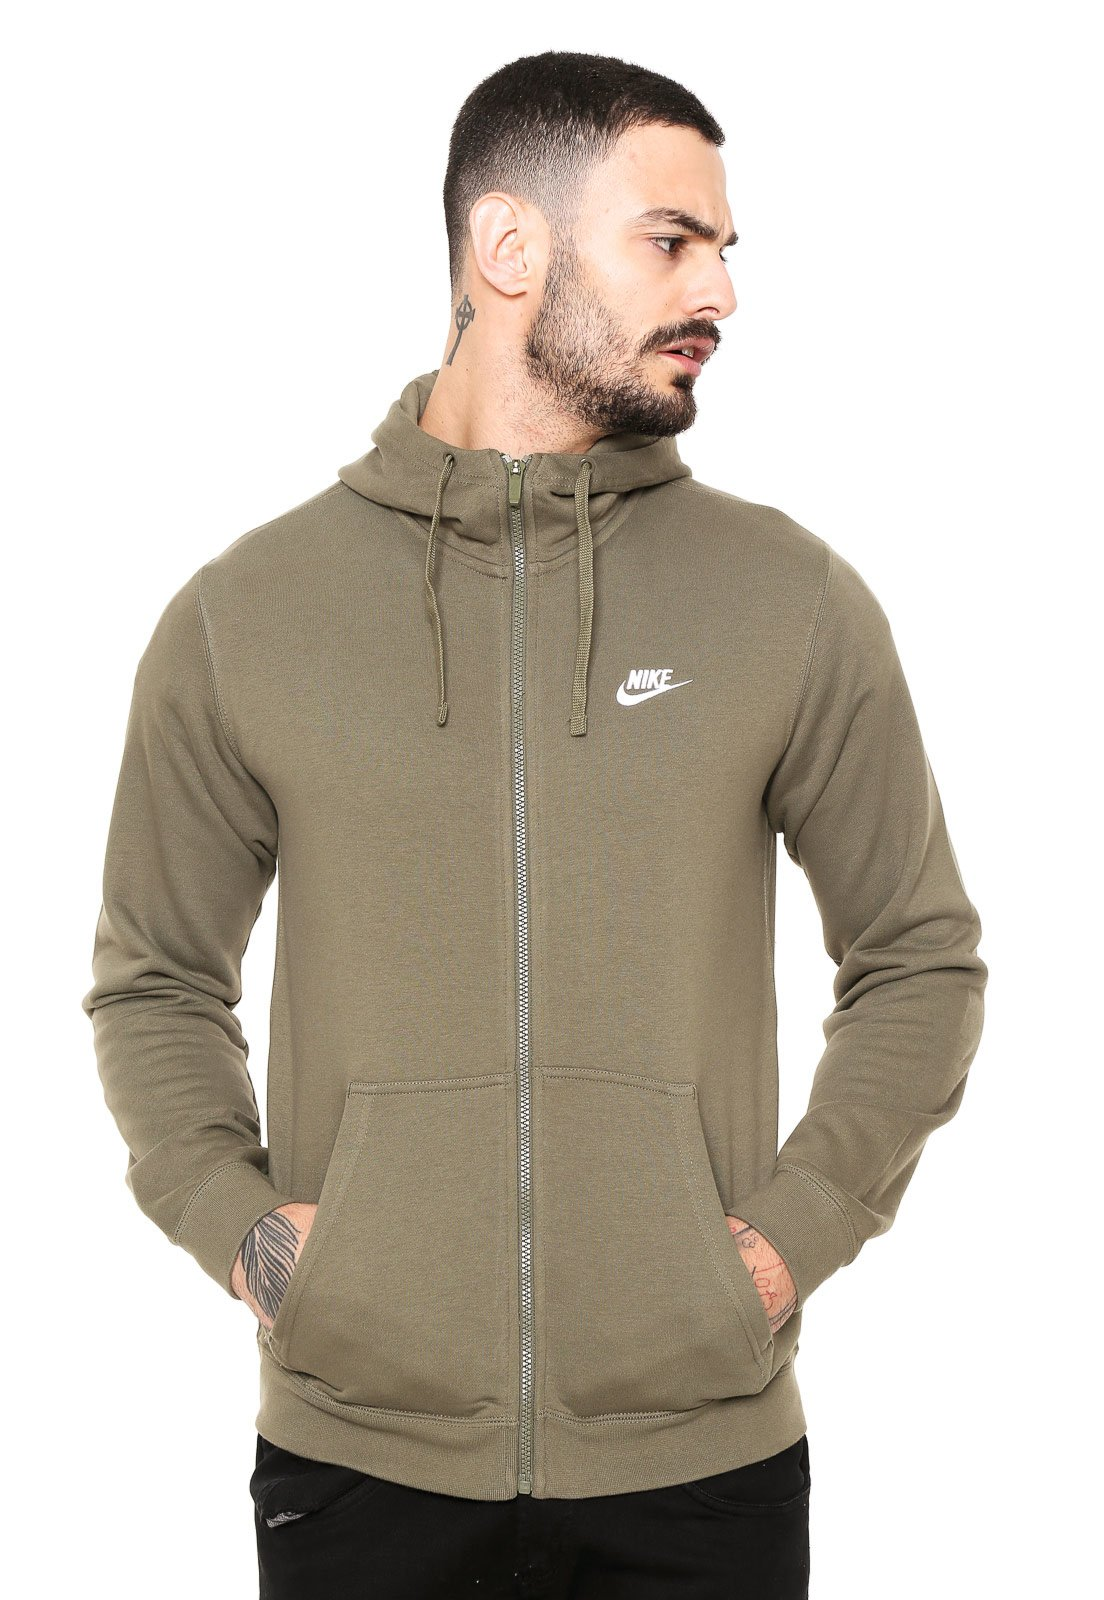 de radio presentar  Jaqueta Nike Sportswear Hoodie FZ Verde - Compre Agora   Kanui Brasil